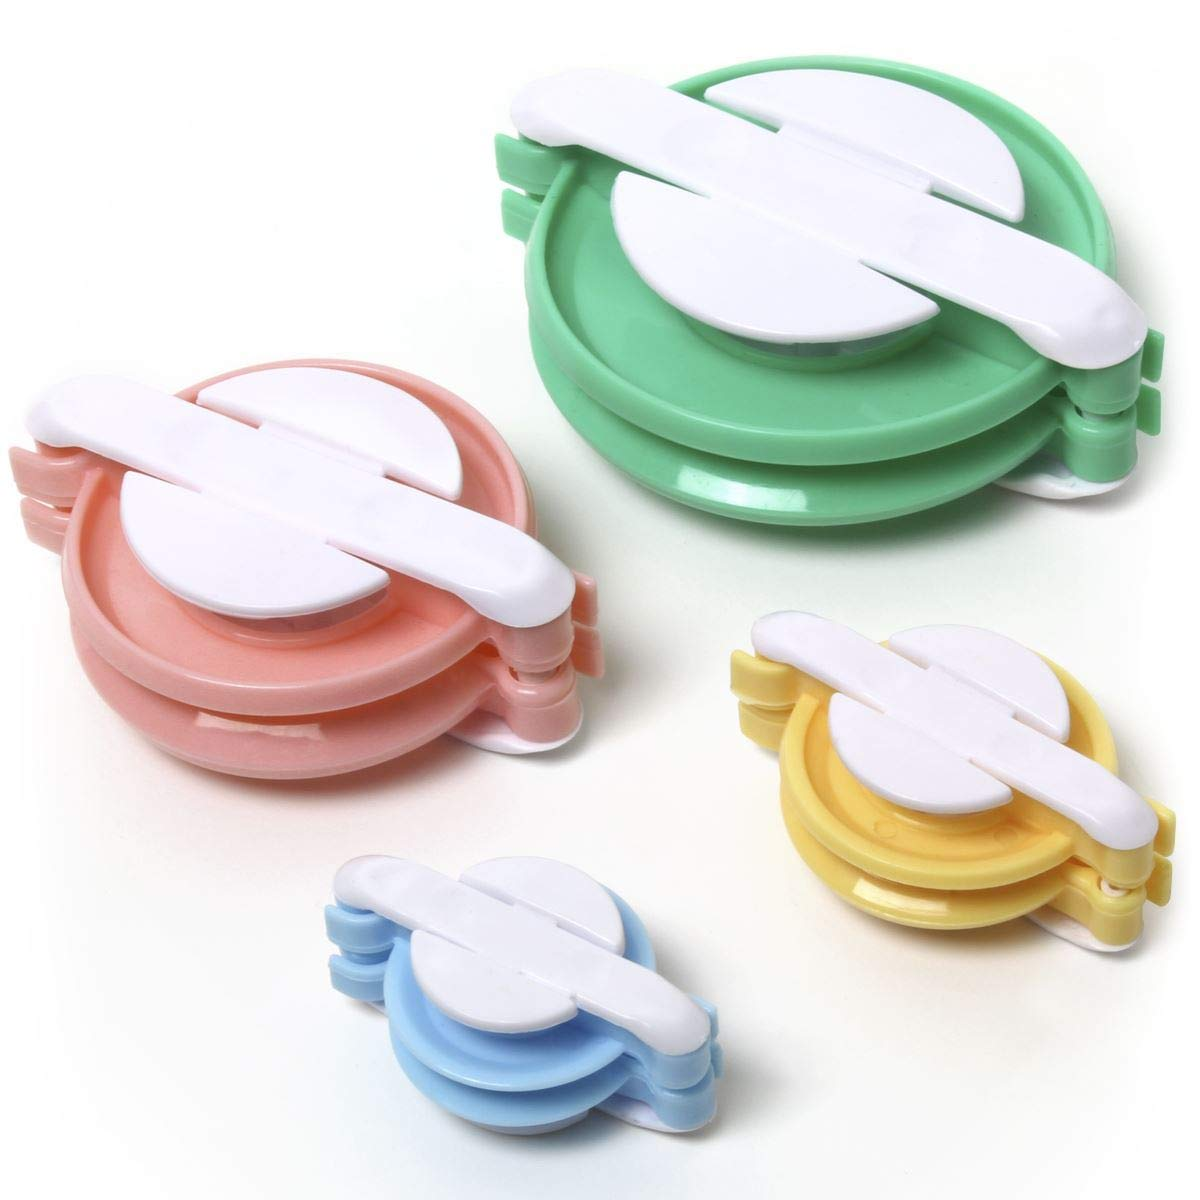 Set di 3,8 cm Set di 4 Pom Pom Maker iGadgitz Home U6957 4,8 cm 8,8 cm Kit Varie Dimensioni Pom Maker 6,8 cm